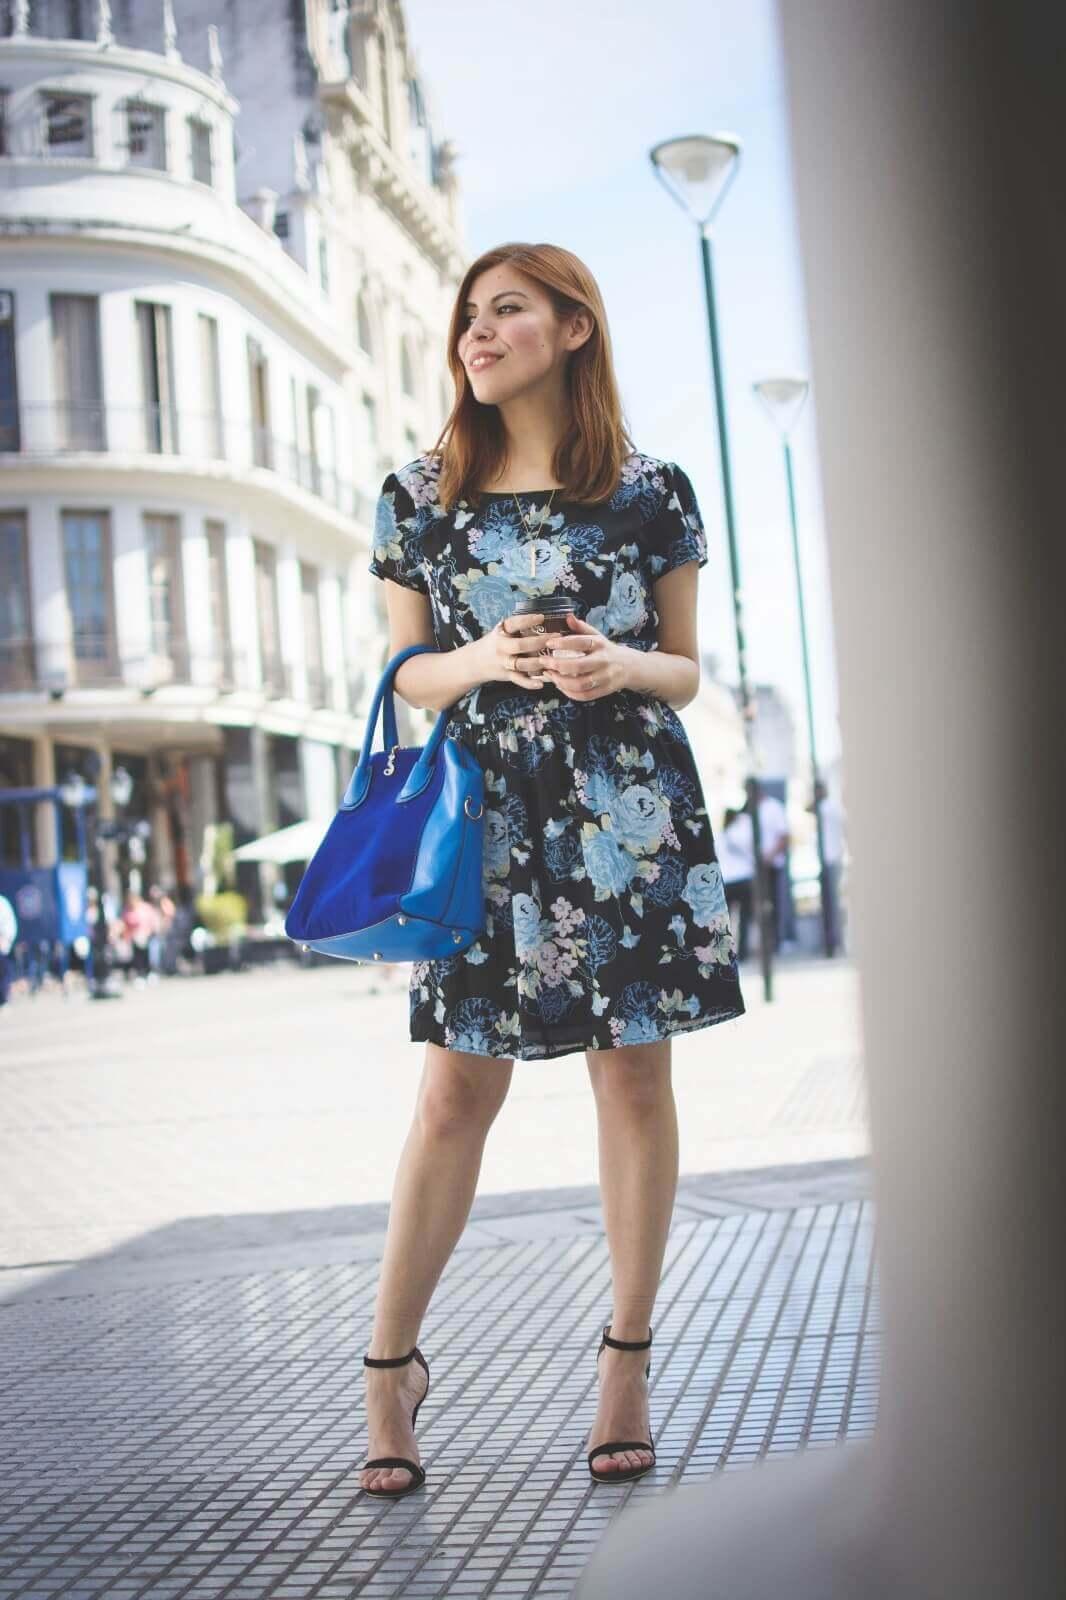 gamiss-black-strappy-sandals-blue-floral-dress-rosegal-cobalt-blue-tote-bag-deborah-ferrero-style-by-deb02